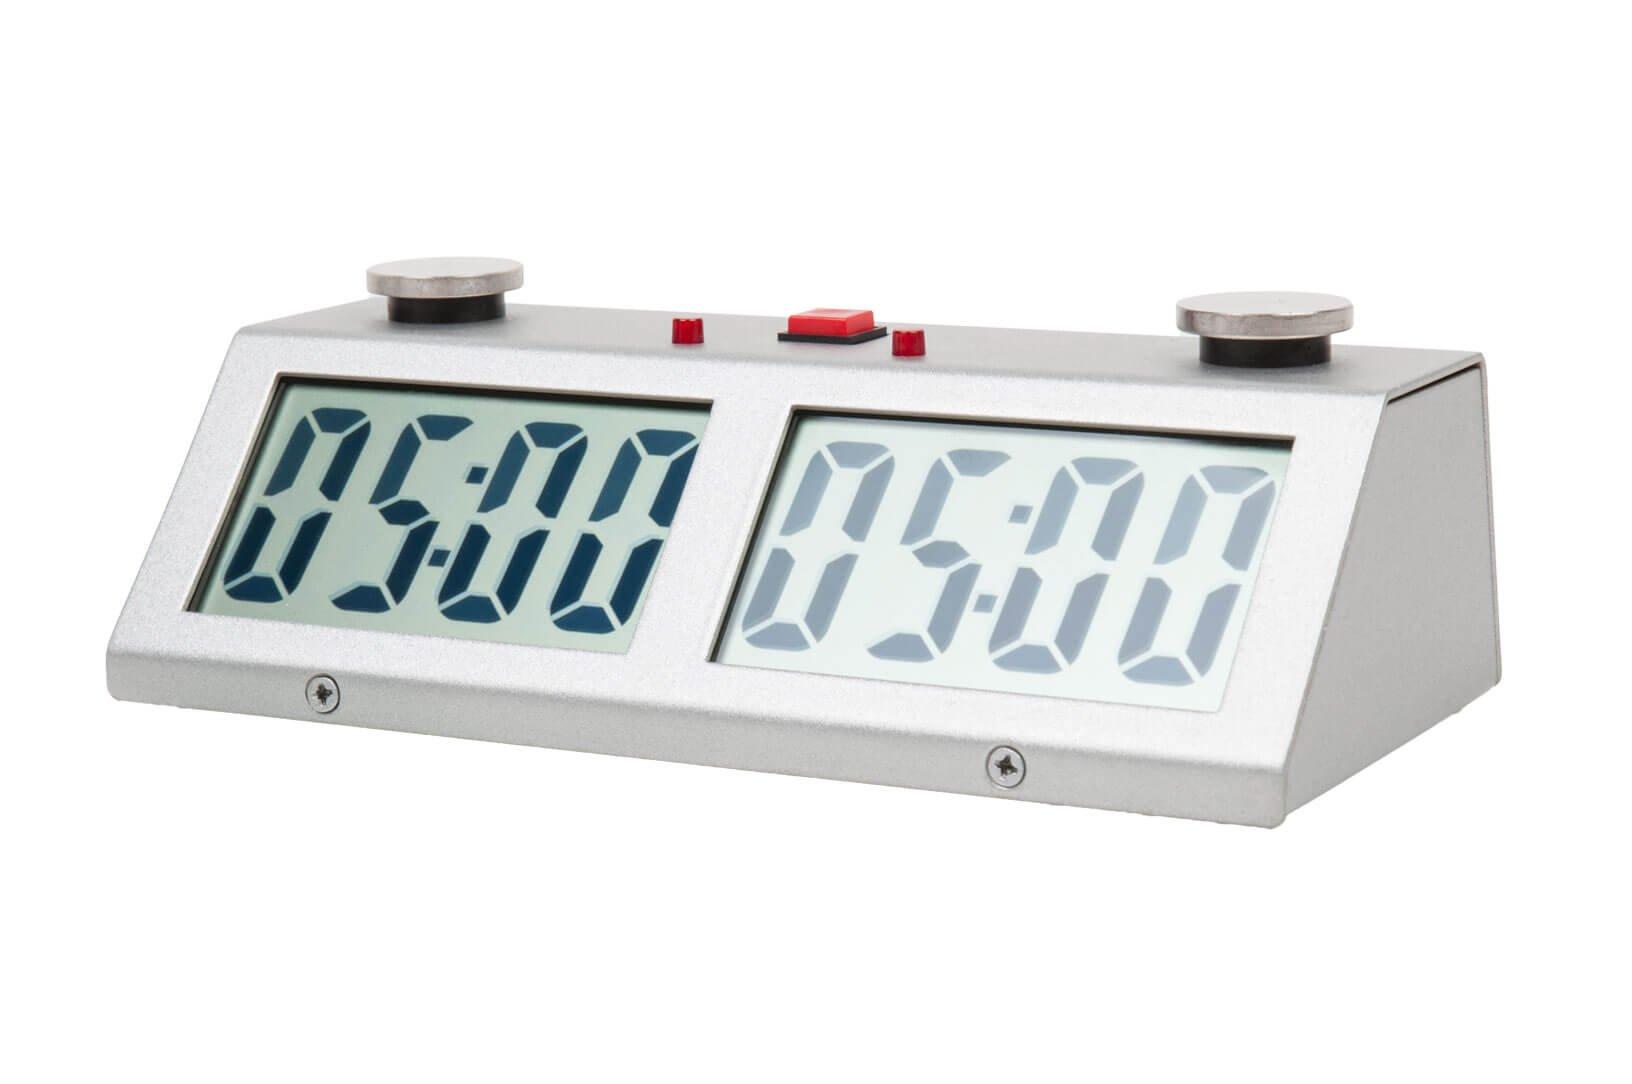 ZMart Pro Digital Chess Clock - Silver